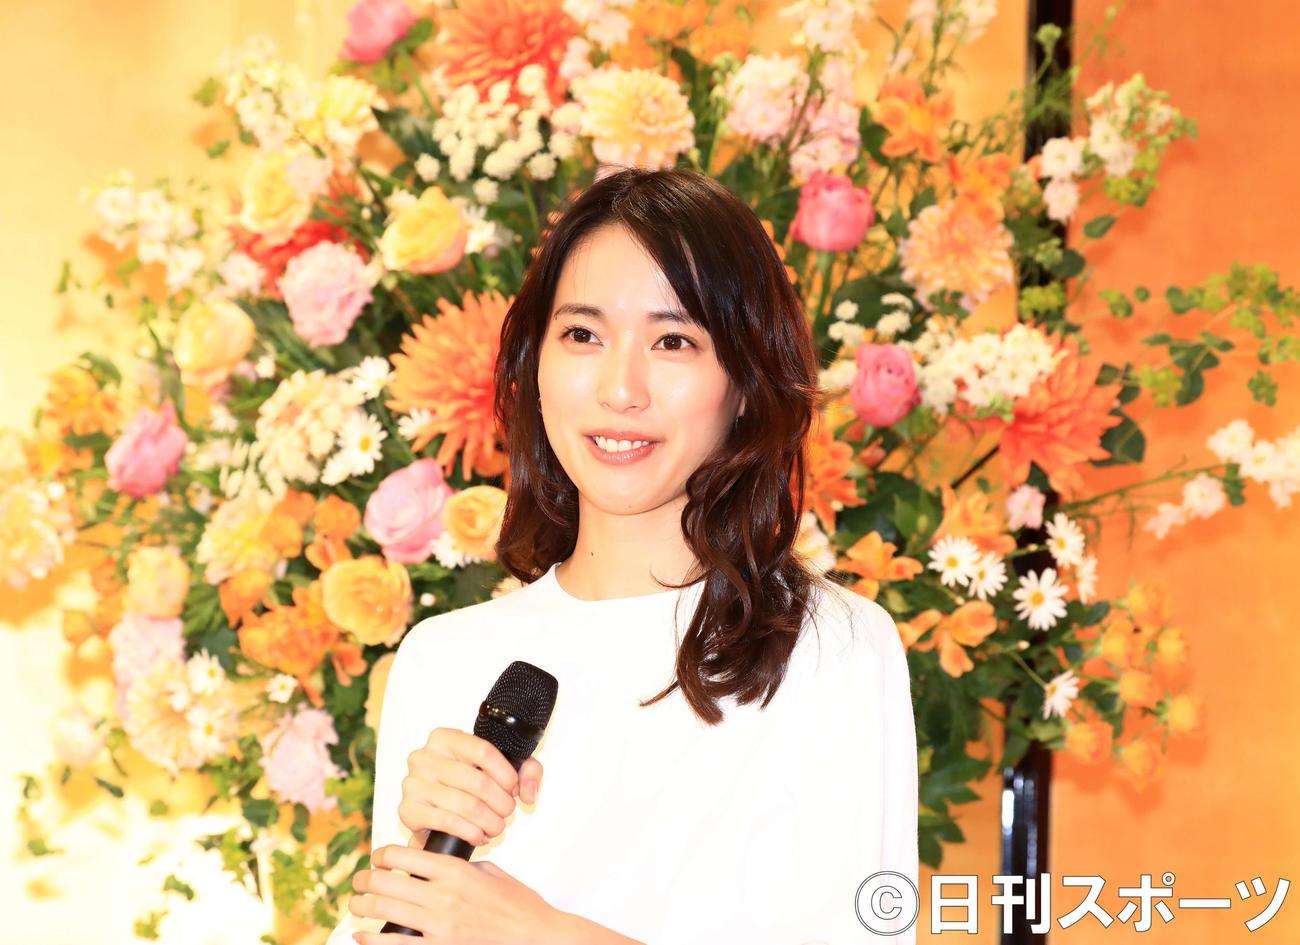 NHK連続テレビ小説「スカーレット」のヒロイン役が決まり会見を行う戸田恵梨香(撮影・江口和貴)